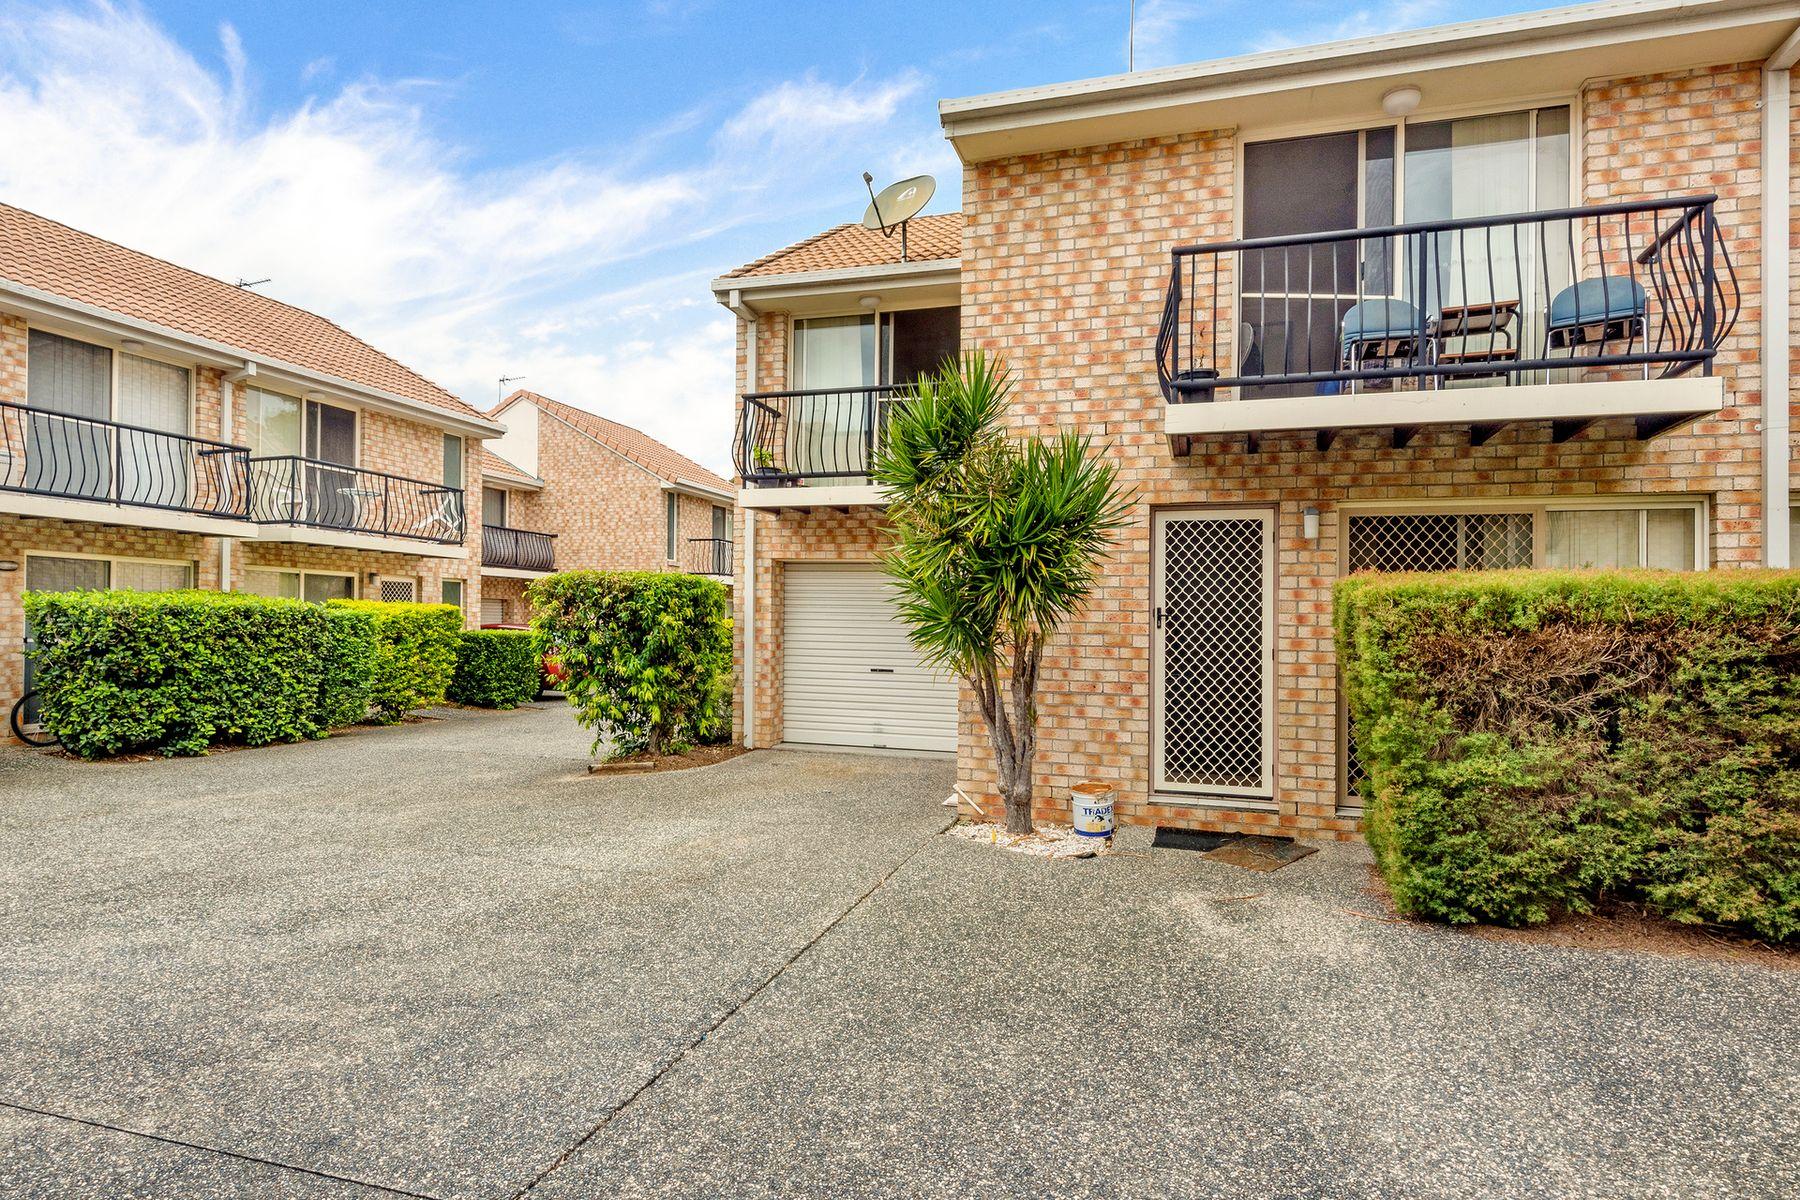 5/19-21 Blake Street, Southport, QLD 4215